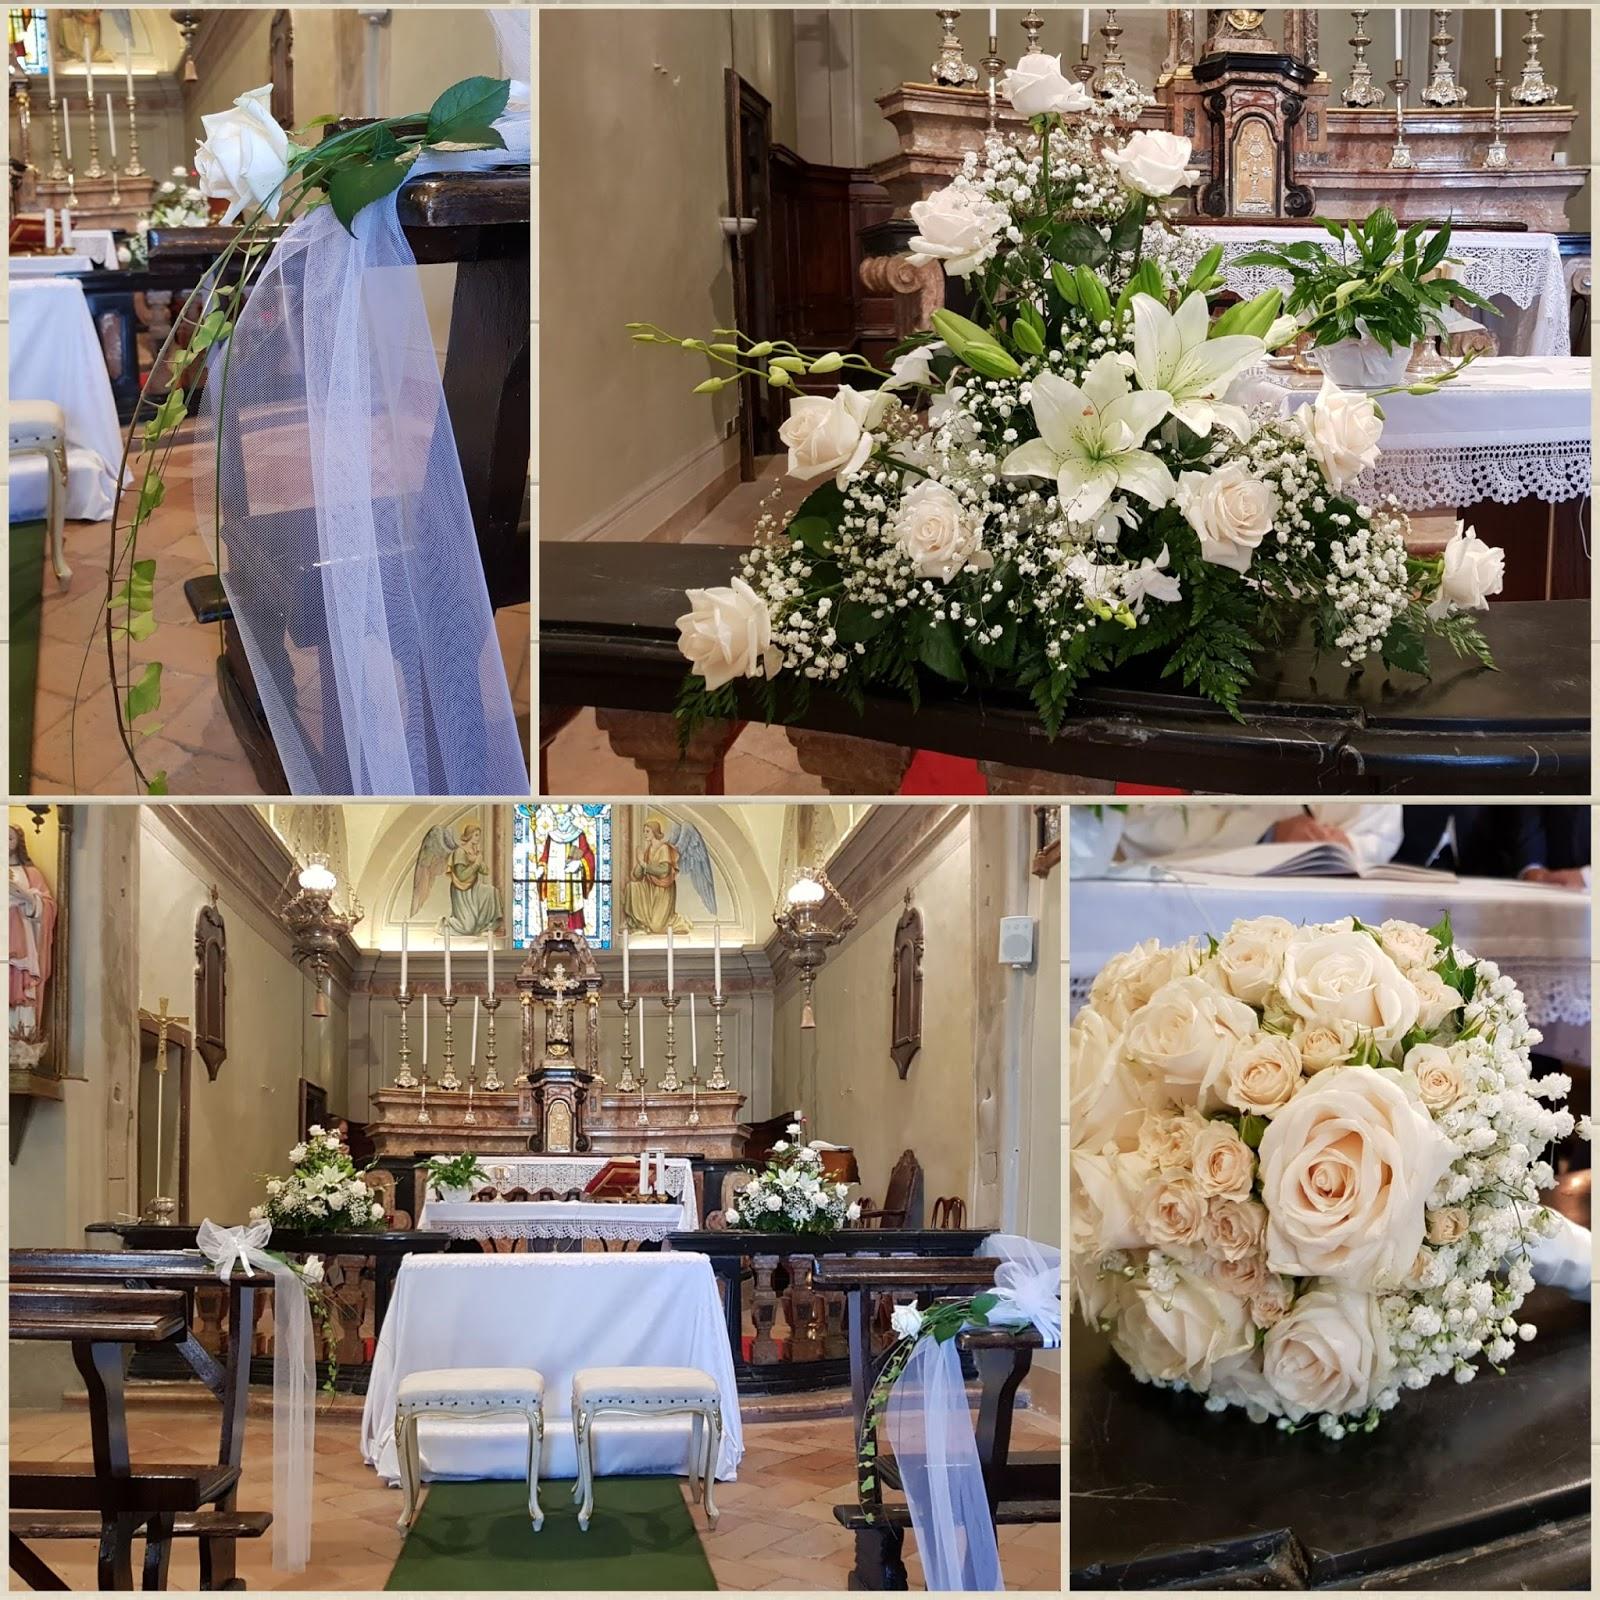 Matrimonio Economico Toscana : Matrimonio economico fiori ambra inventa idee dal mondo